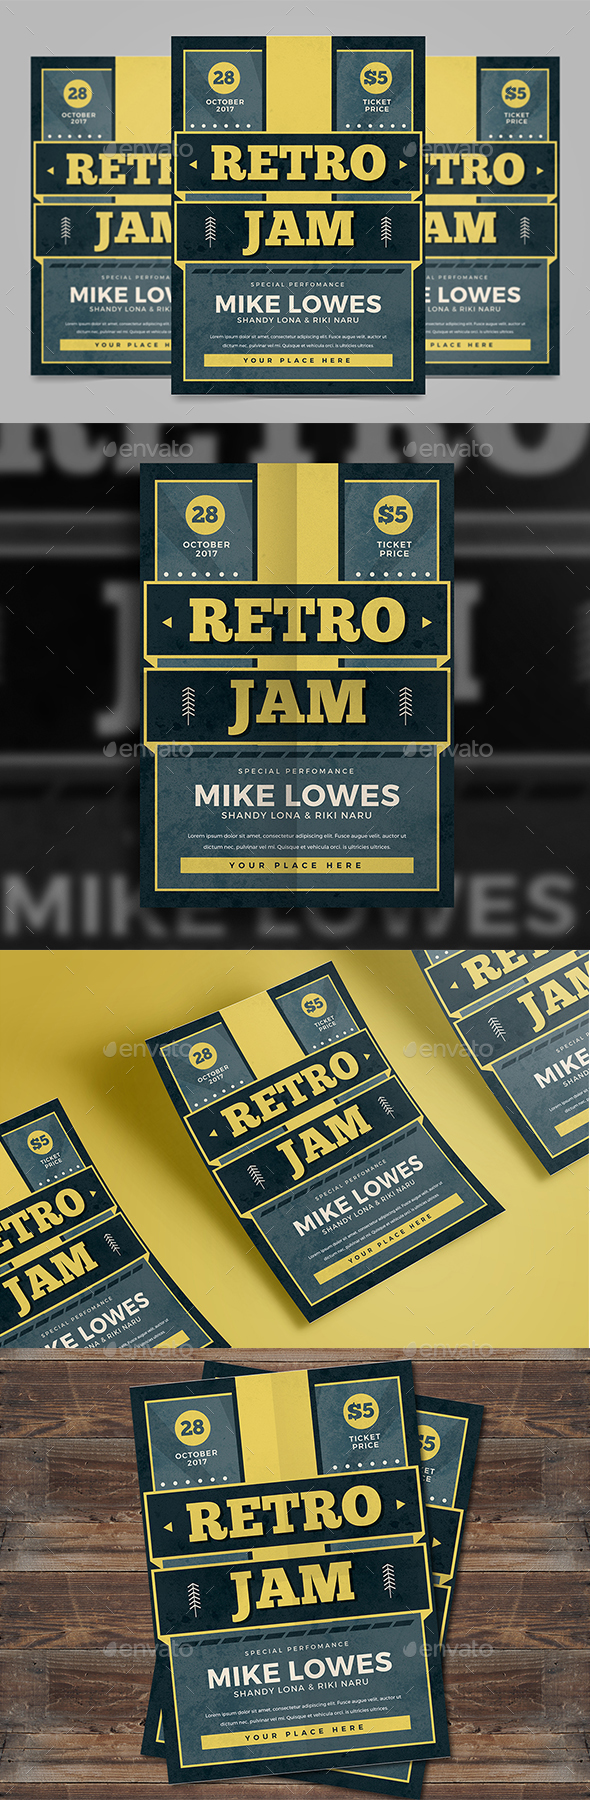 Retro Jam Flyer - Events Flyers